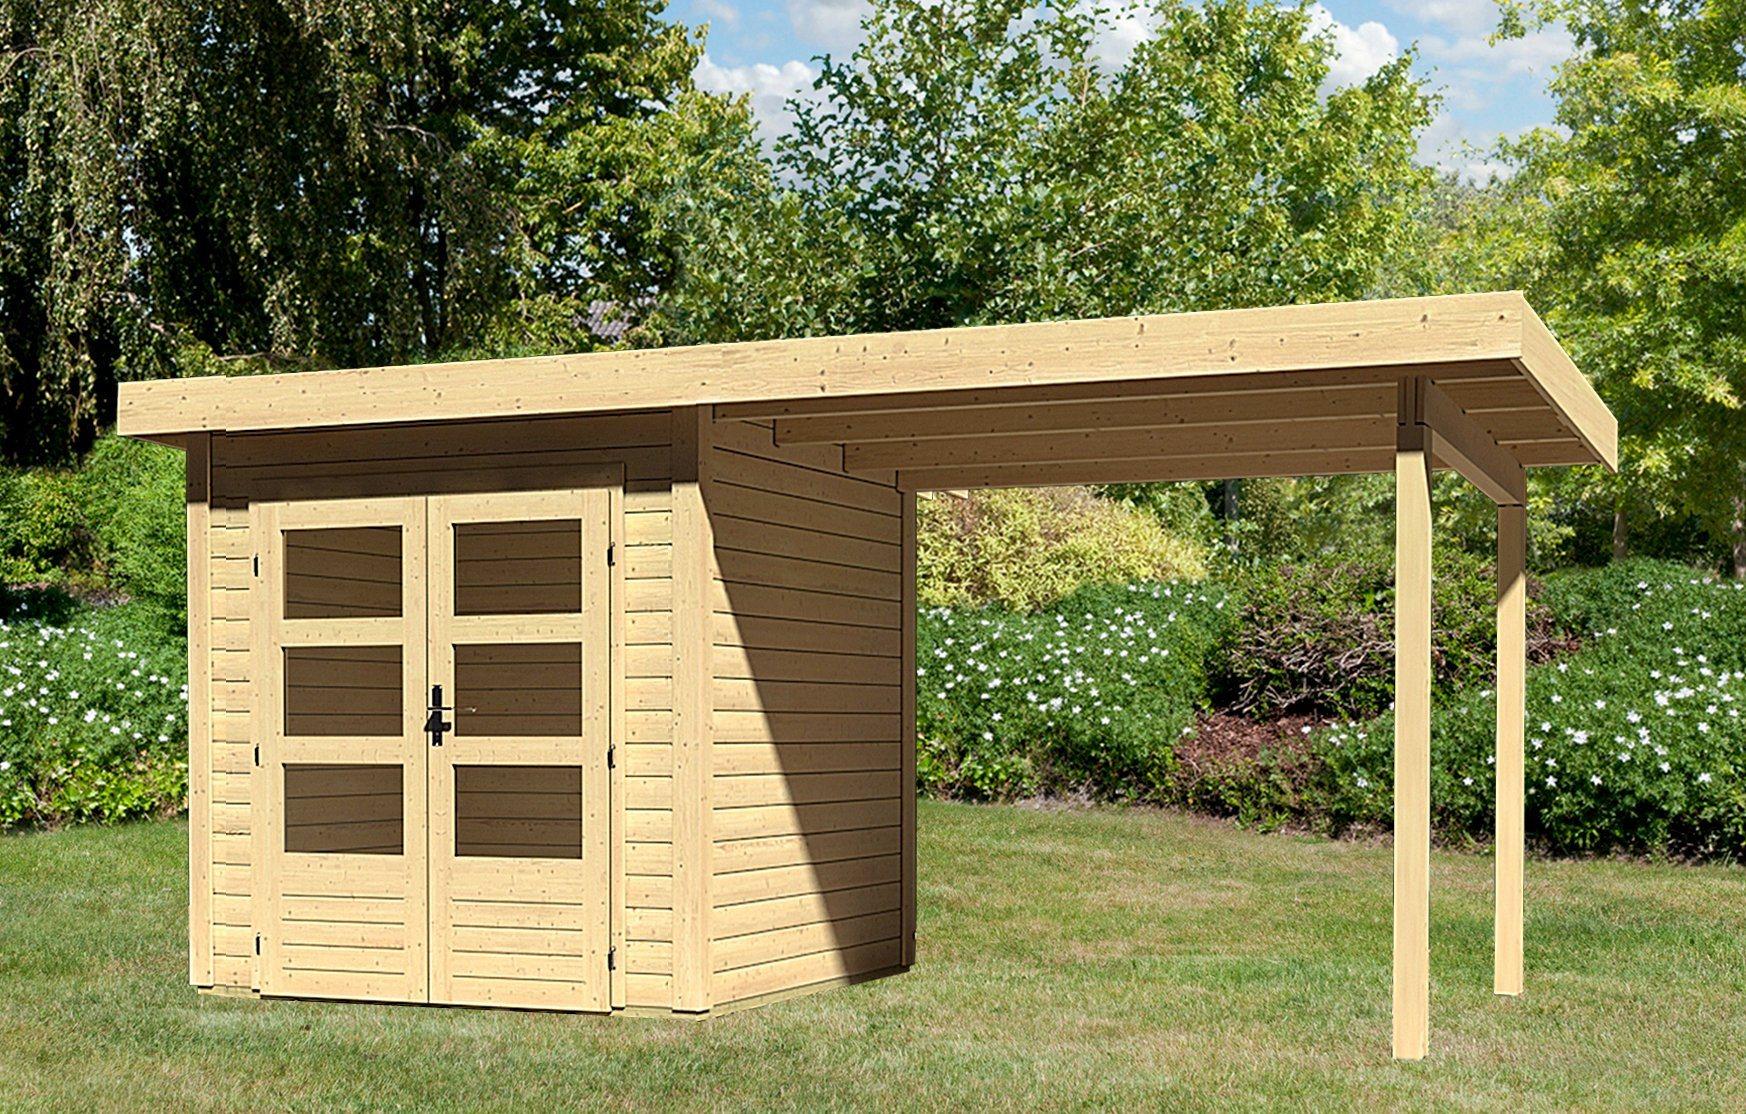 KARIBU Gartenhaus »Kandern 1«, Gesamtmaß (BxT): 482x232 cm, mit Anbaudach | Garten > Gartenhäuser | Karibu